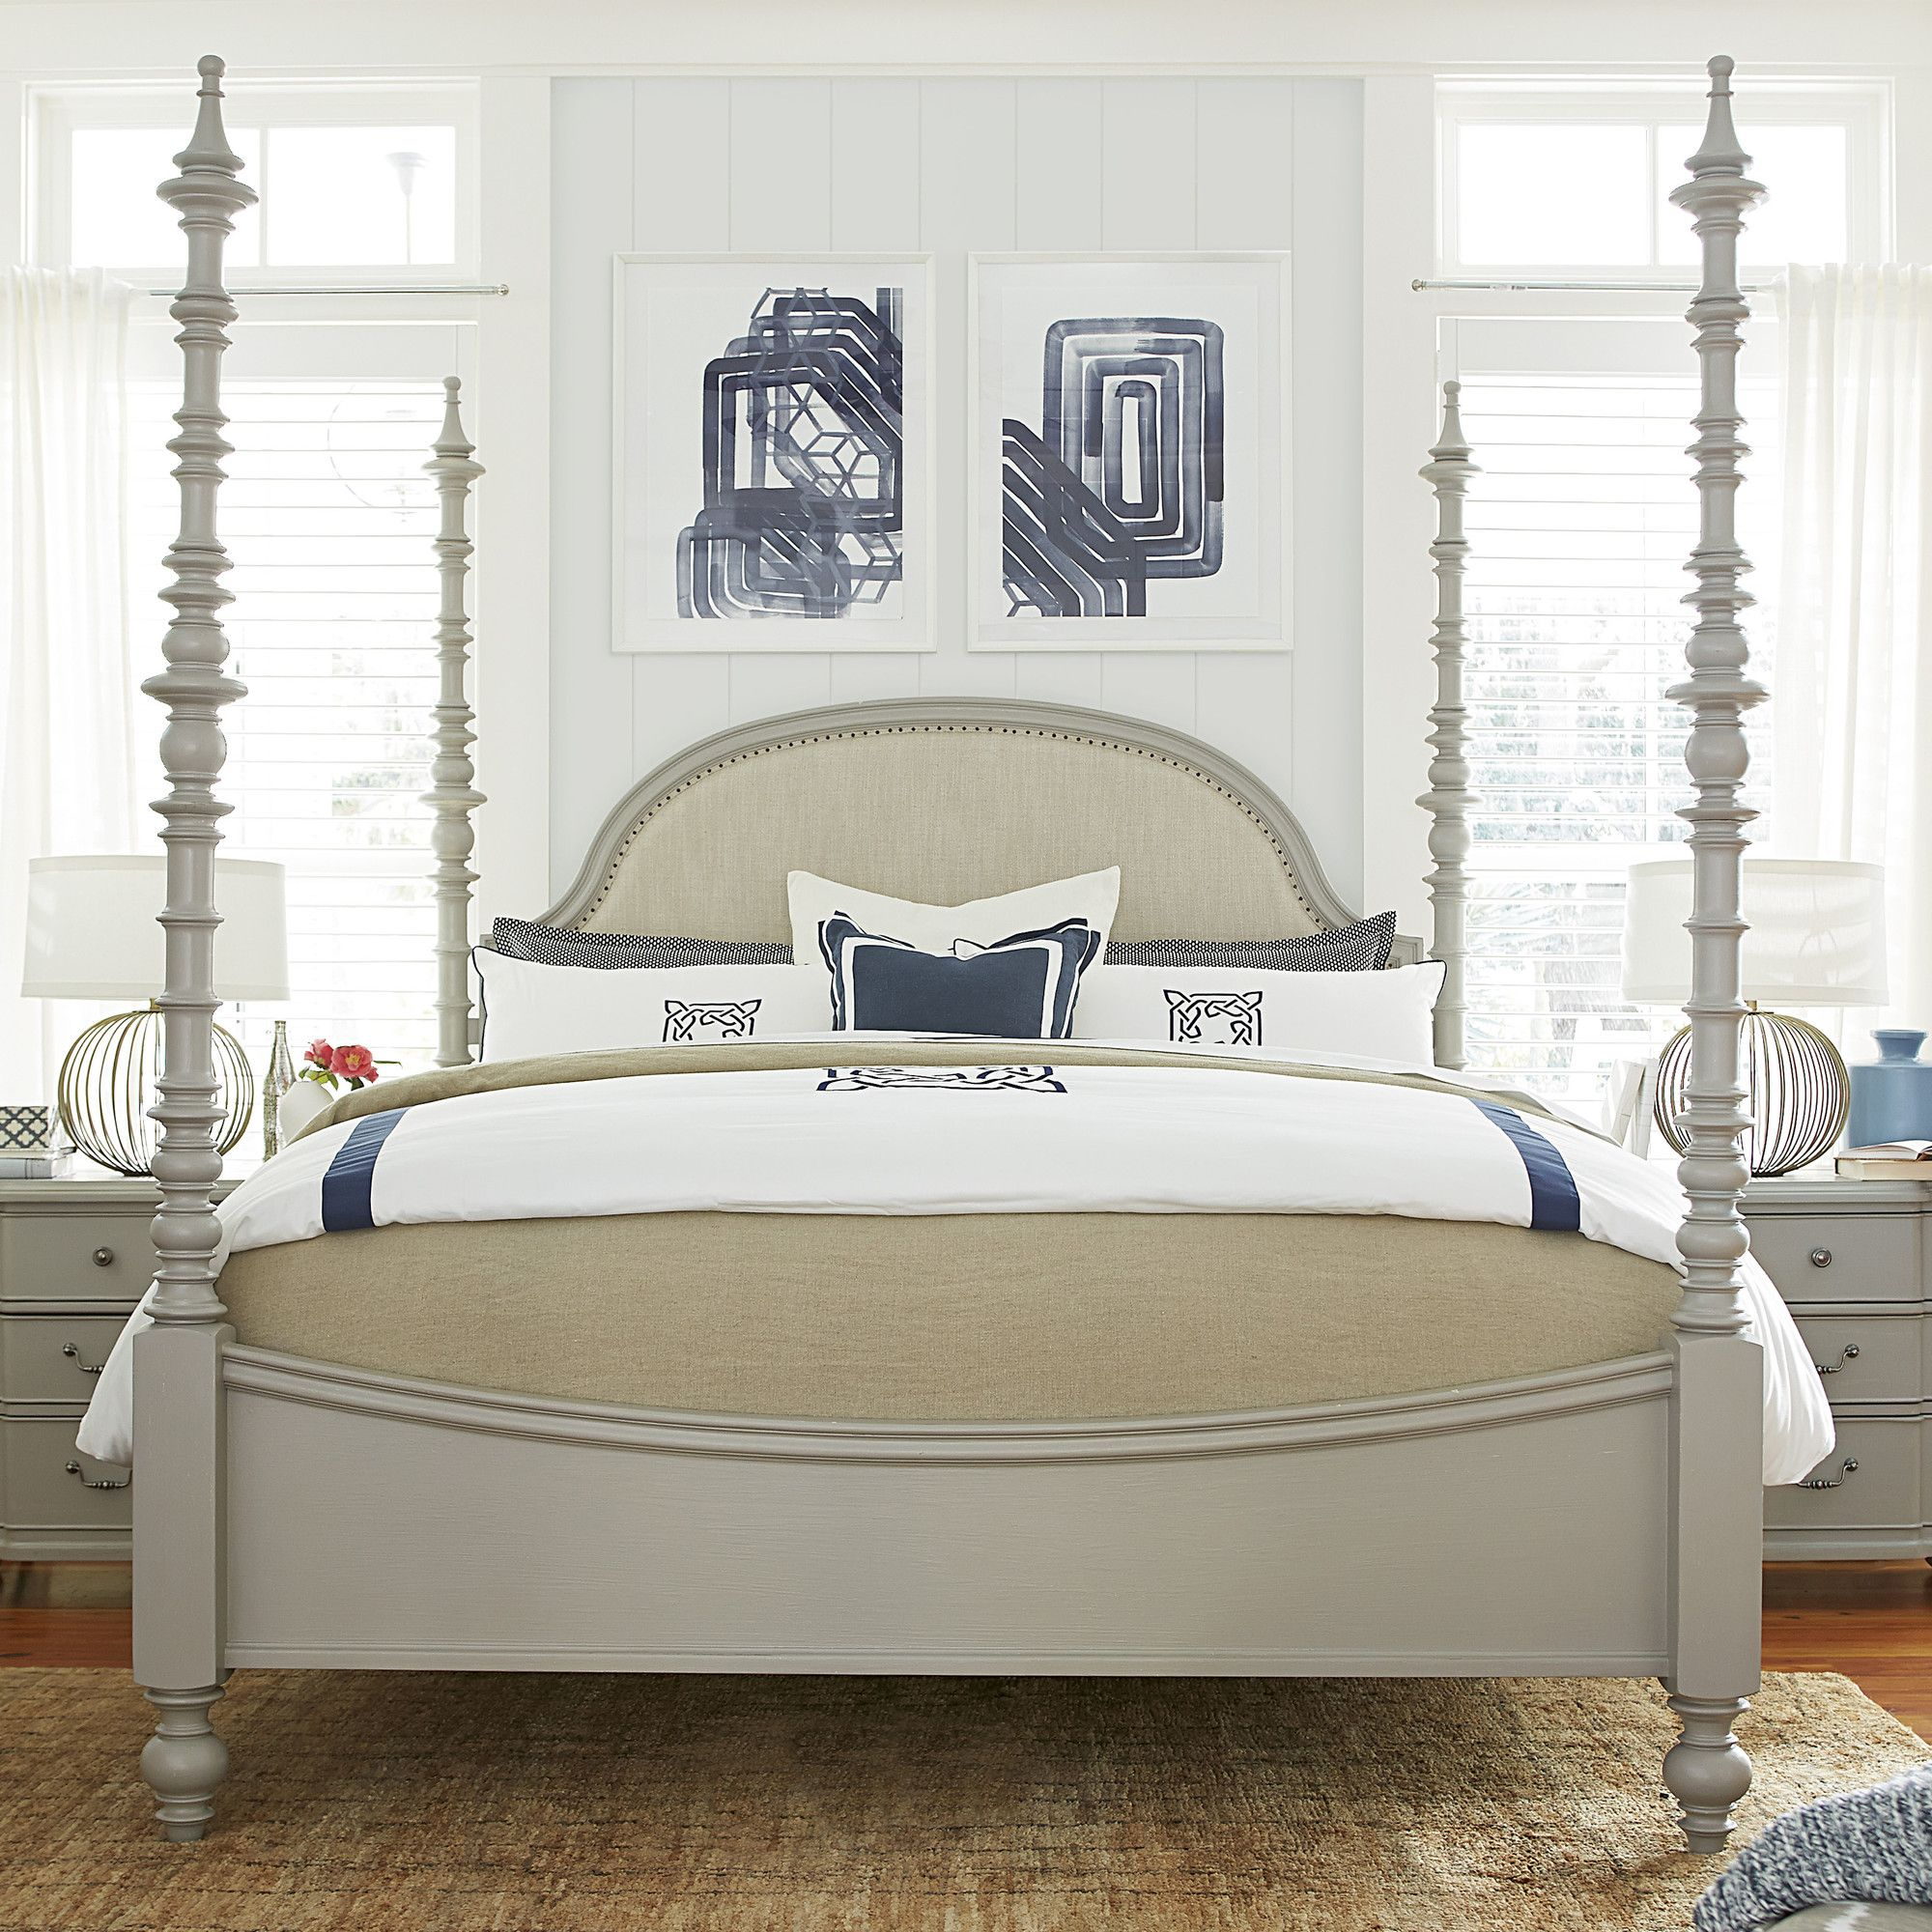 Pleasing House Joss Joss Main Bedding Joss Main Helena Four Poster Bed Master Bedroom Main Nautical Bedding houzz-02 Joss And Main Bedding